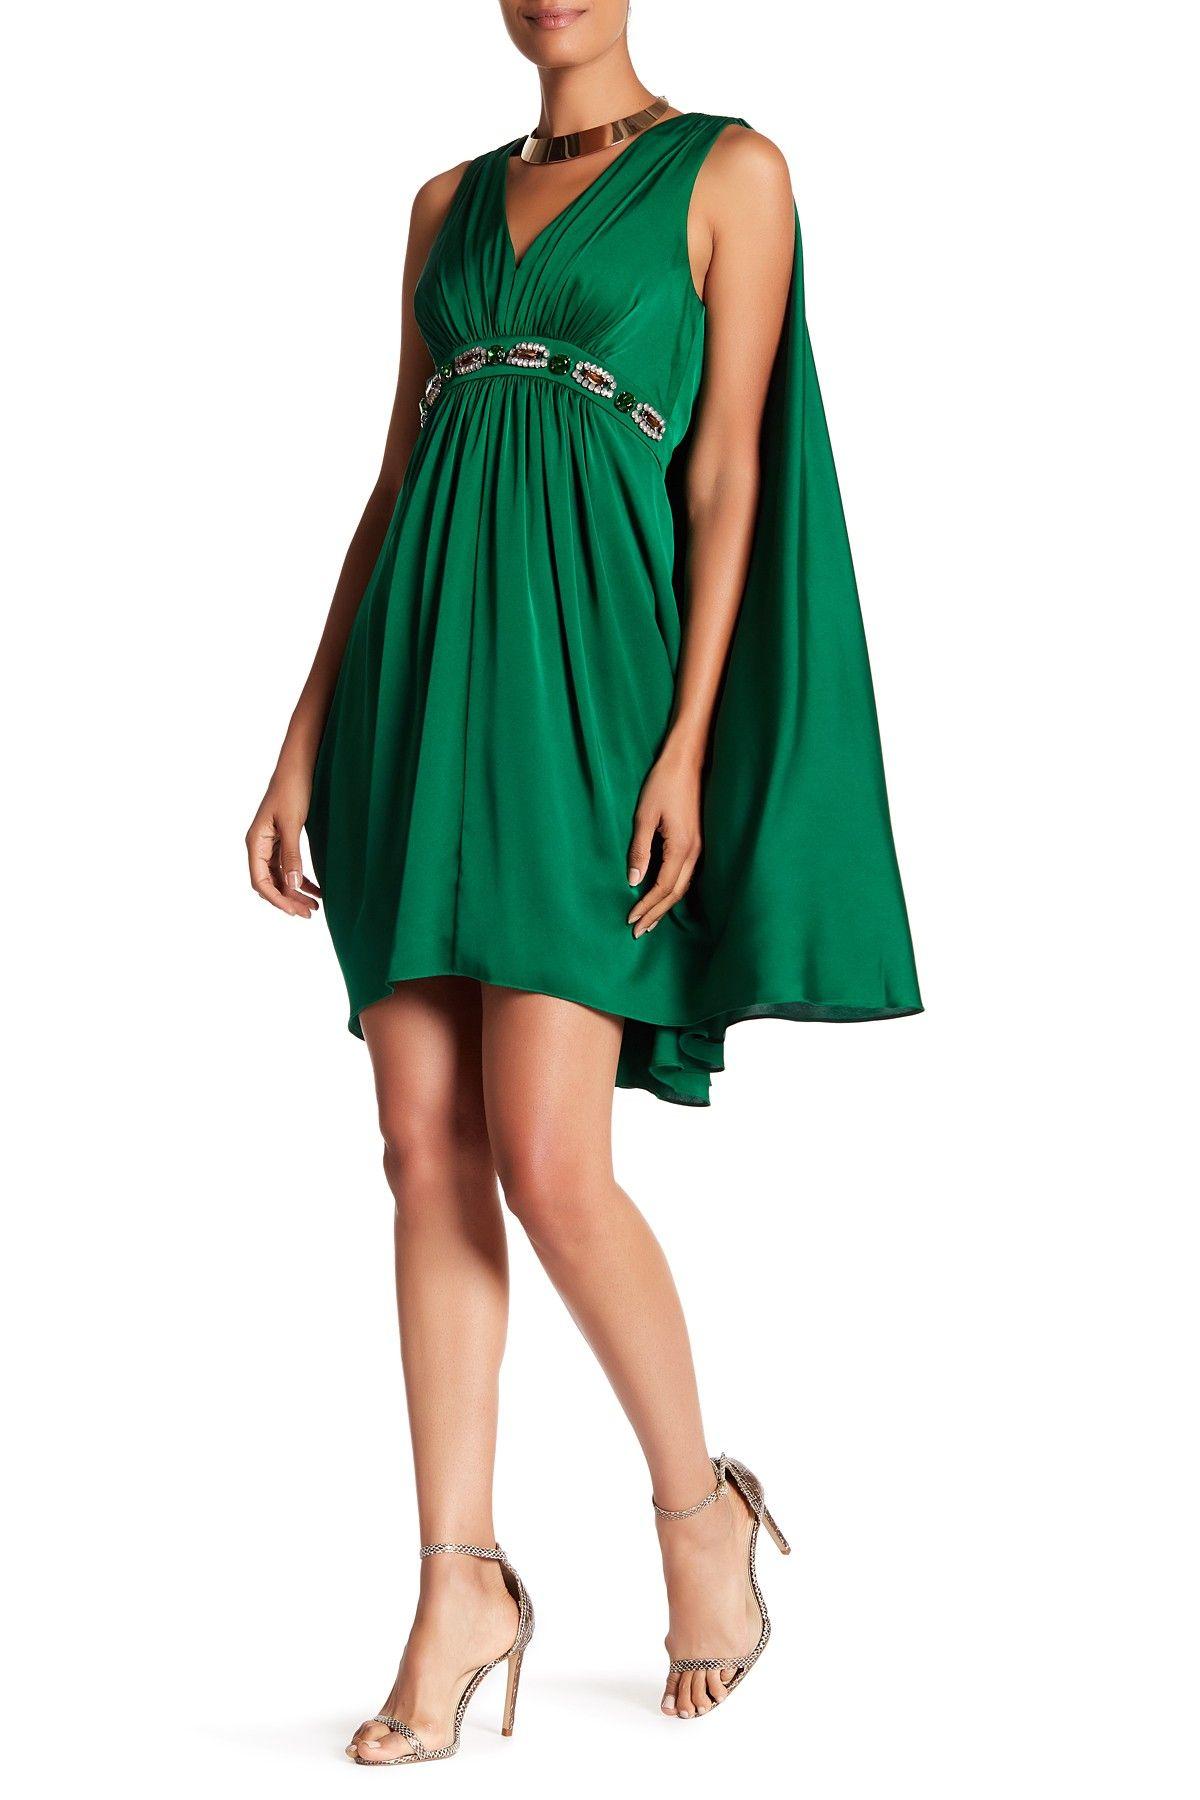 Green dress v neck  Trina Turk  Prestige Embellished Cape Sleeve Dress  Products